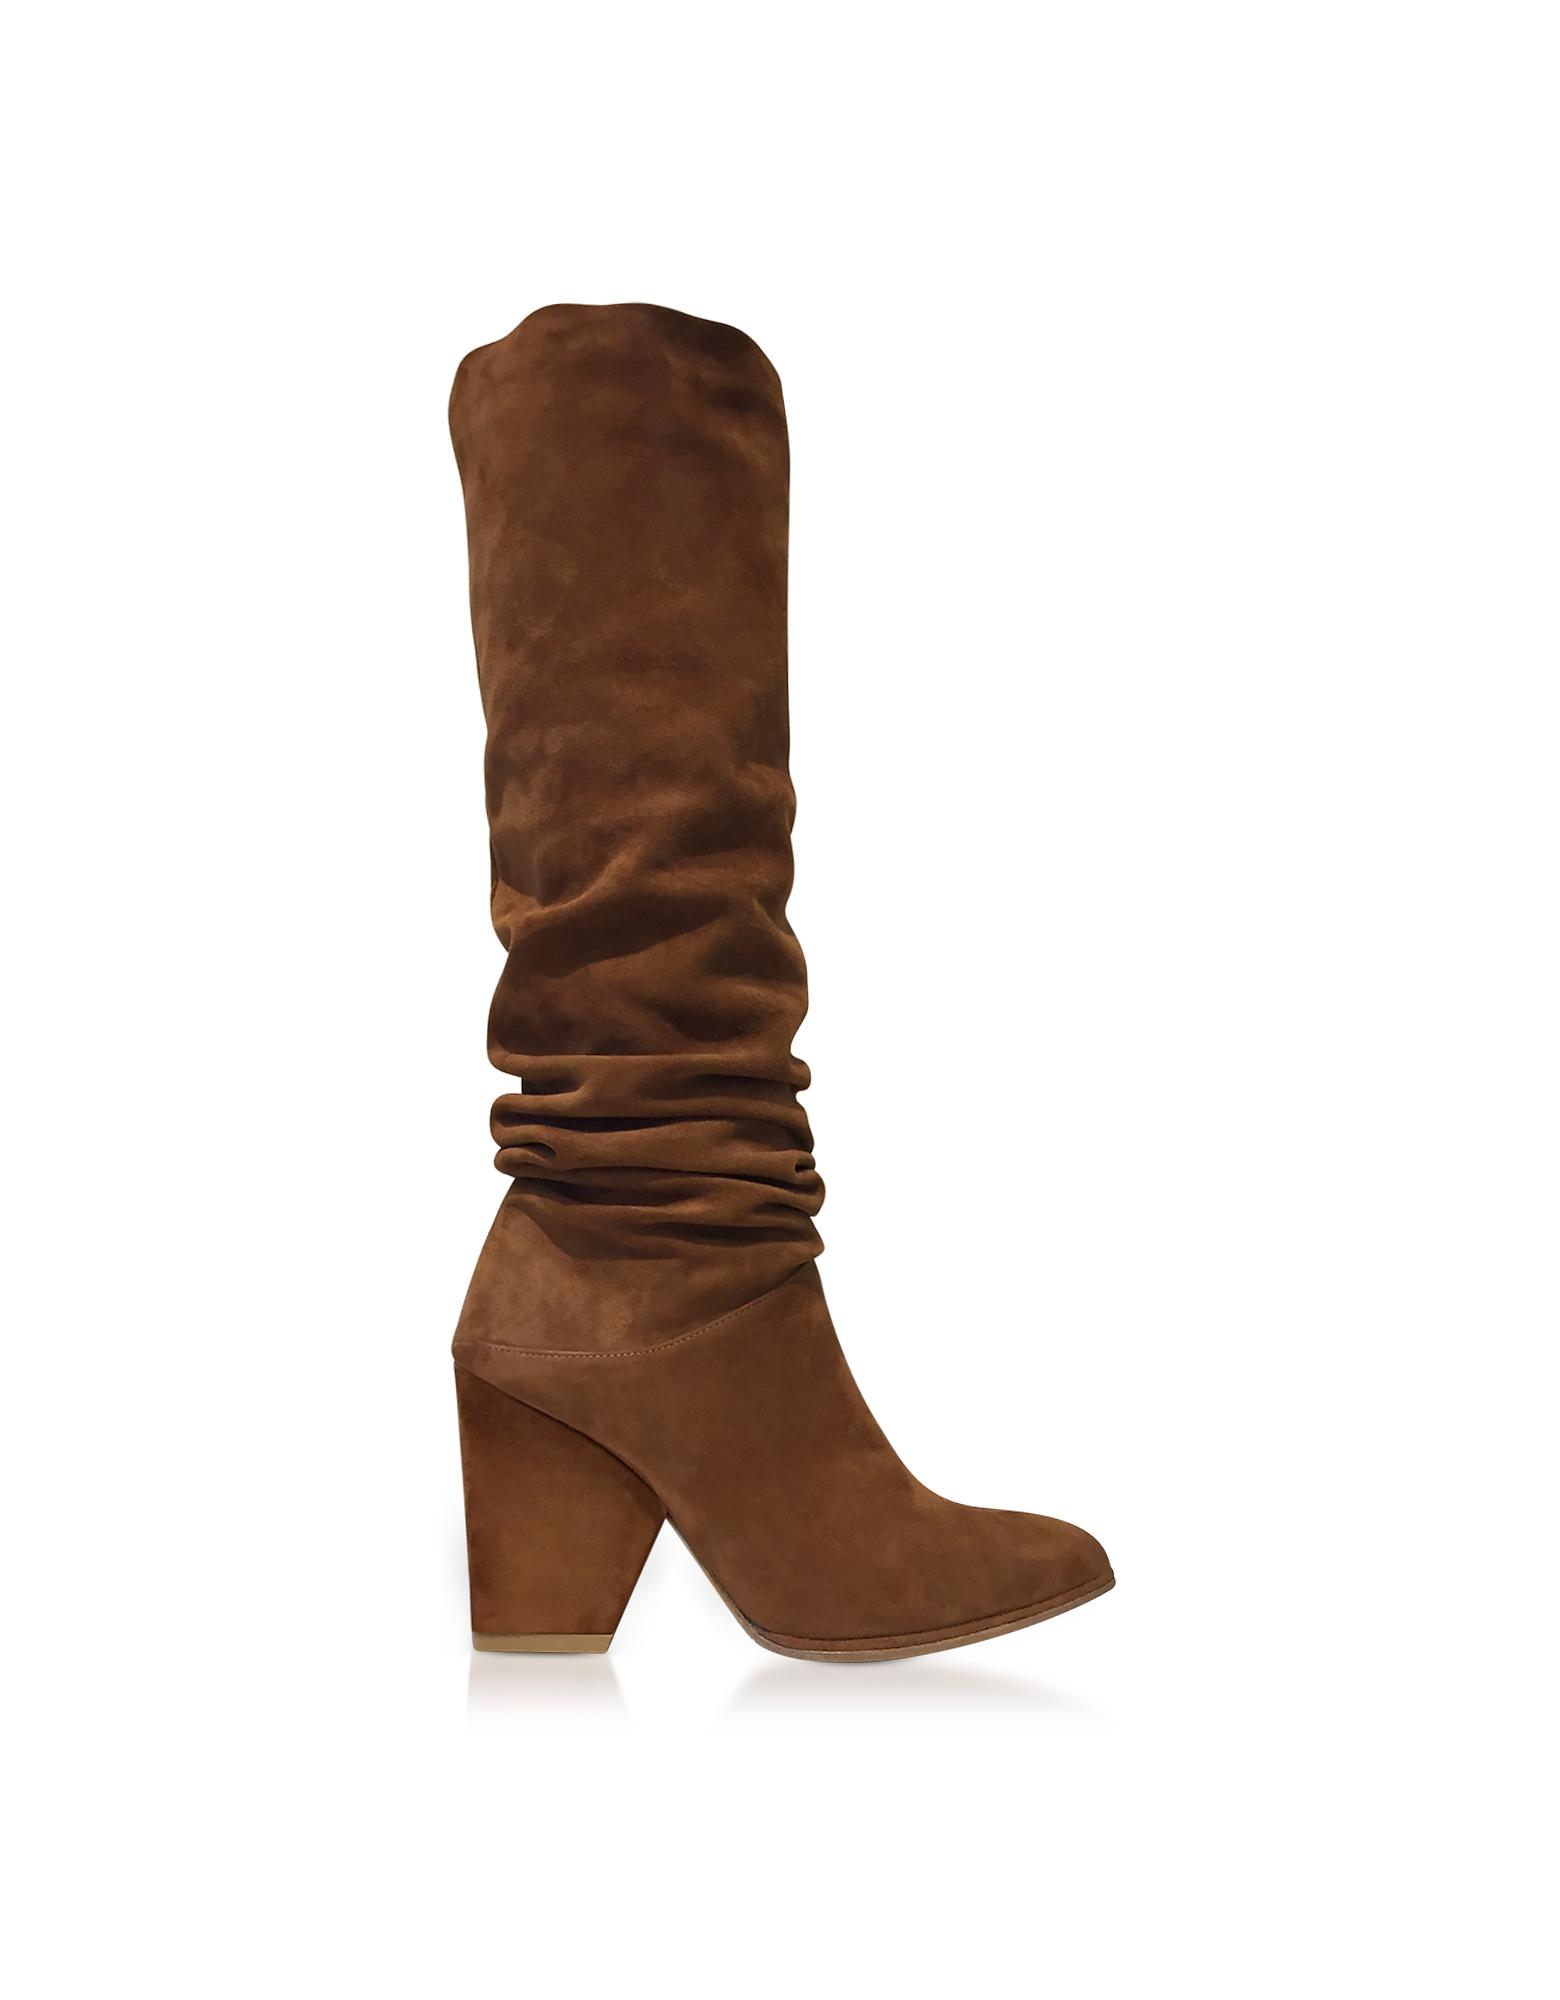 Stuart Weitzman Shoes, Smashing Amaretto Brown Suede High Heel Boots